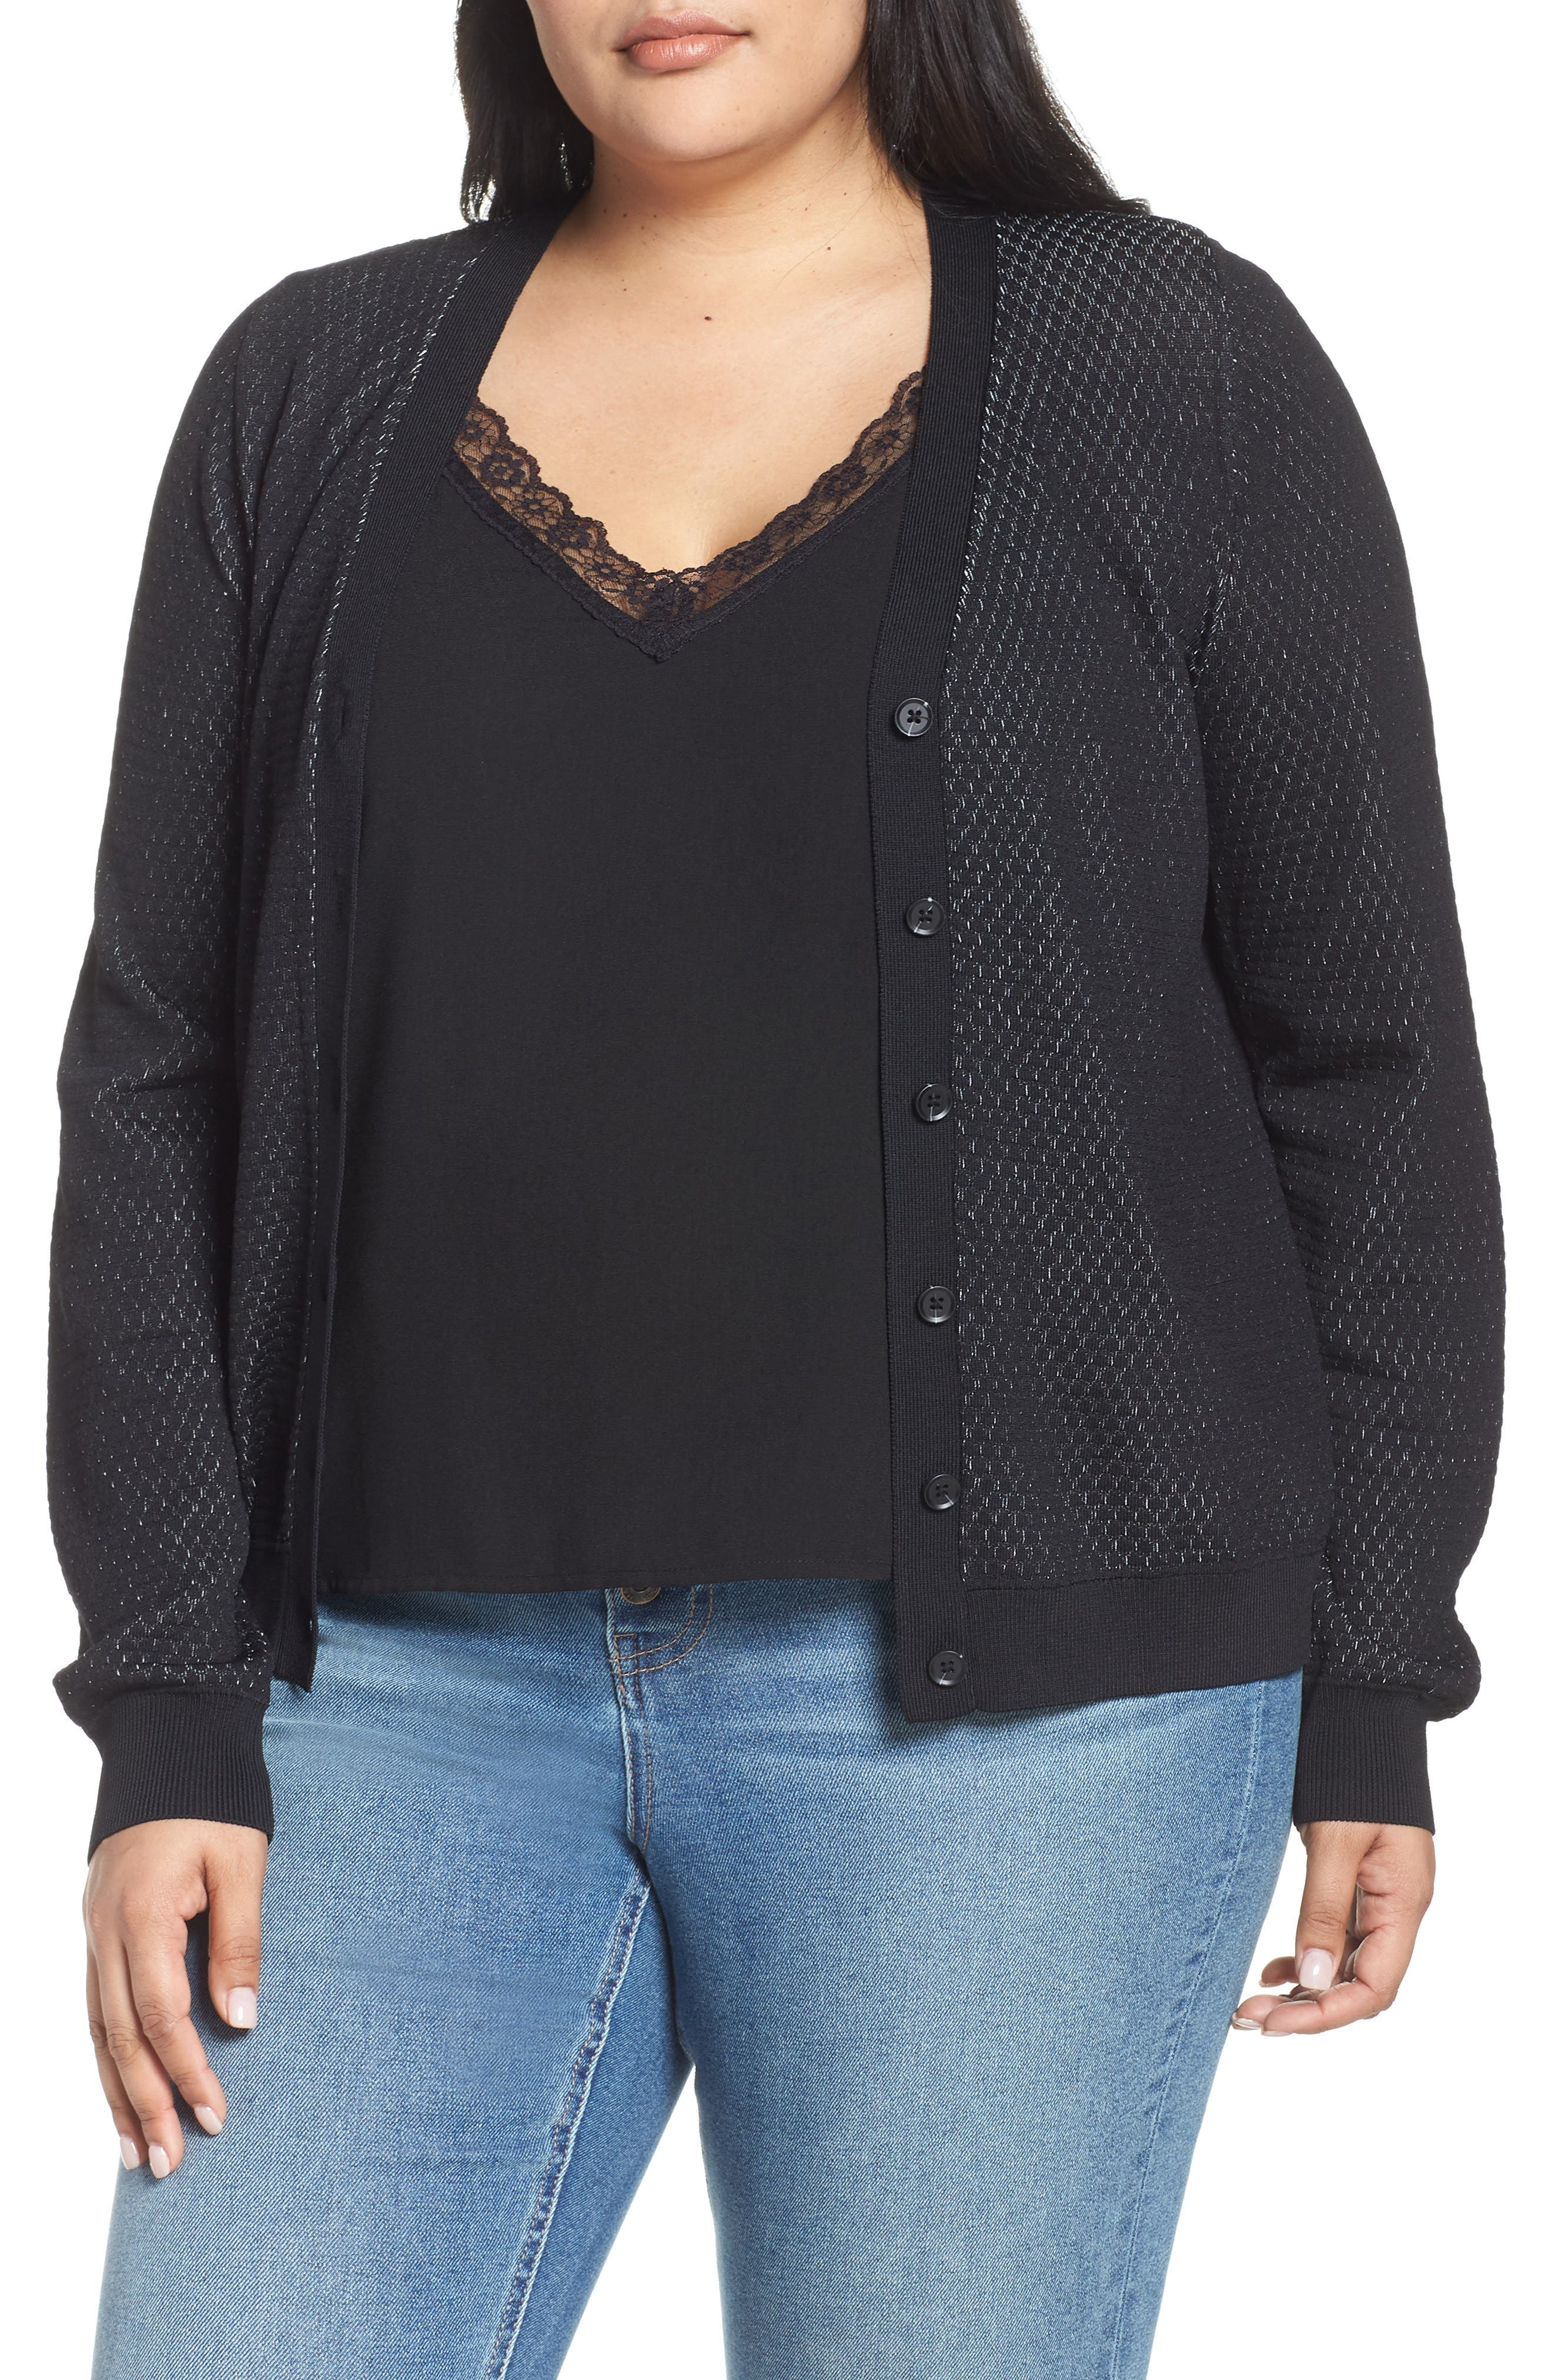 Plus Size Rachel Rachel Roy Presley Button Cardigan, Black